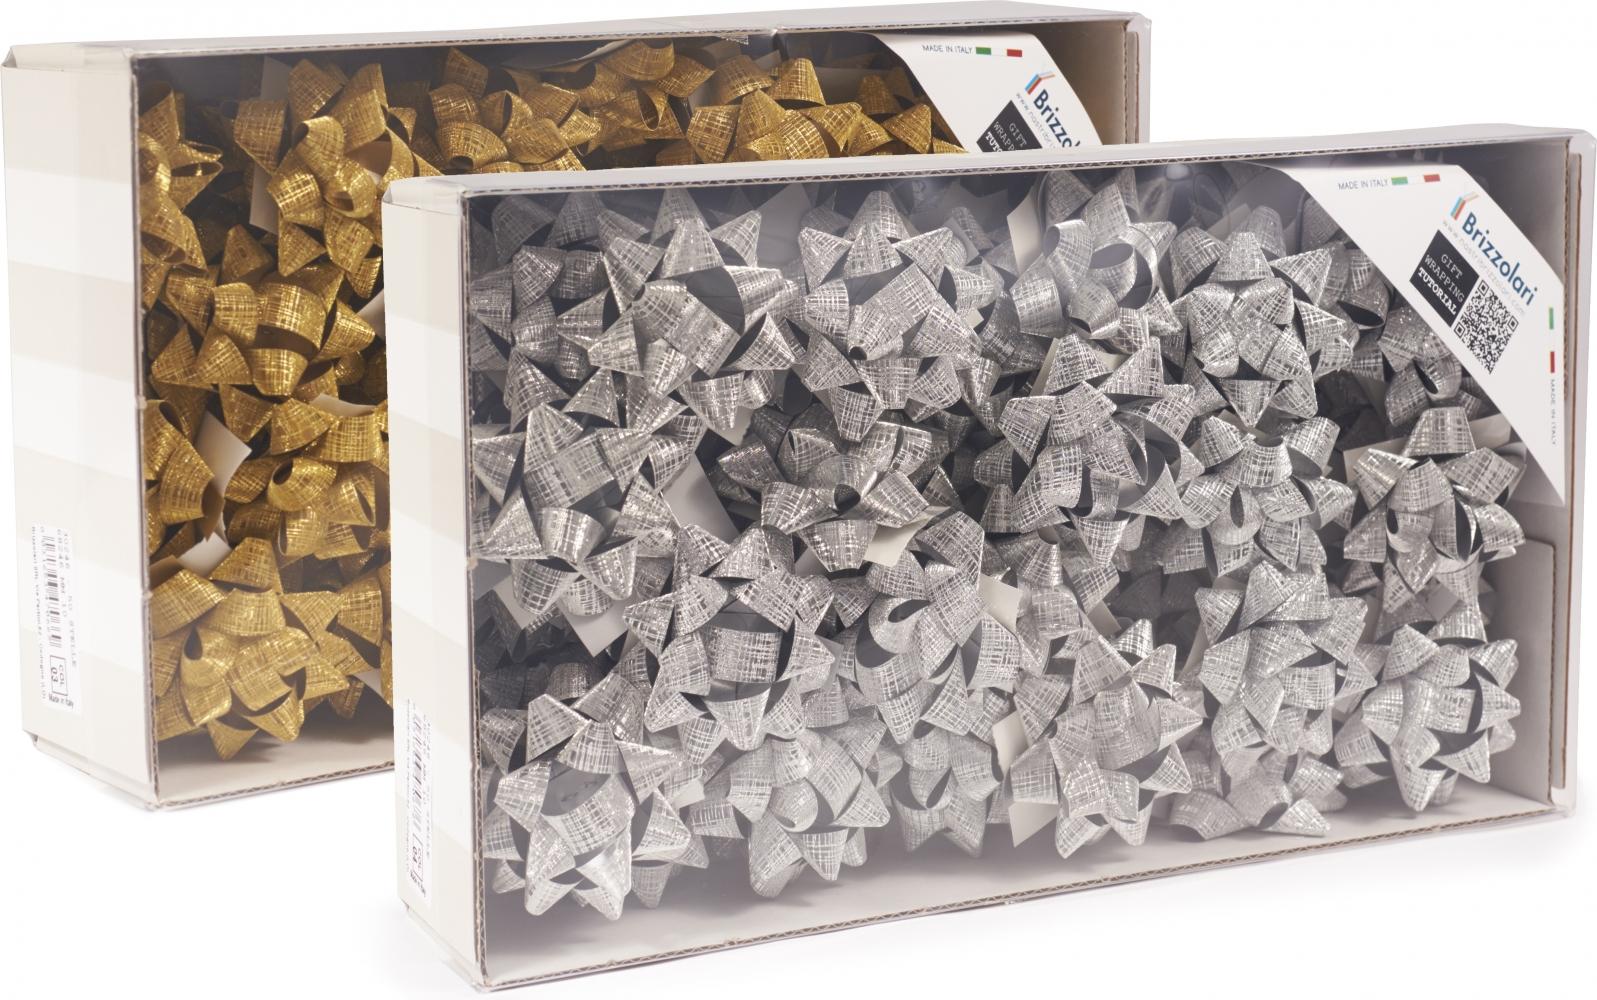 Stelle adesive pp tessy (100 pezzi)